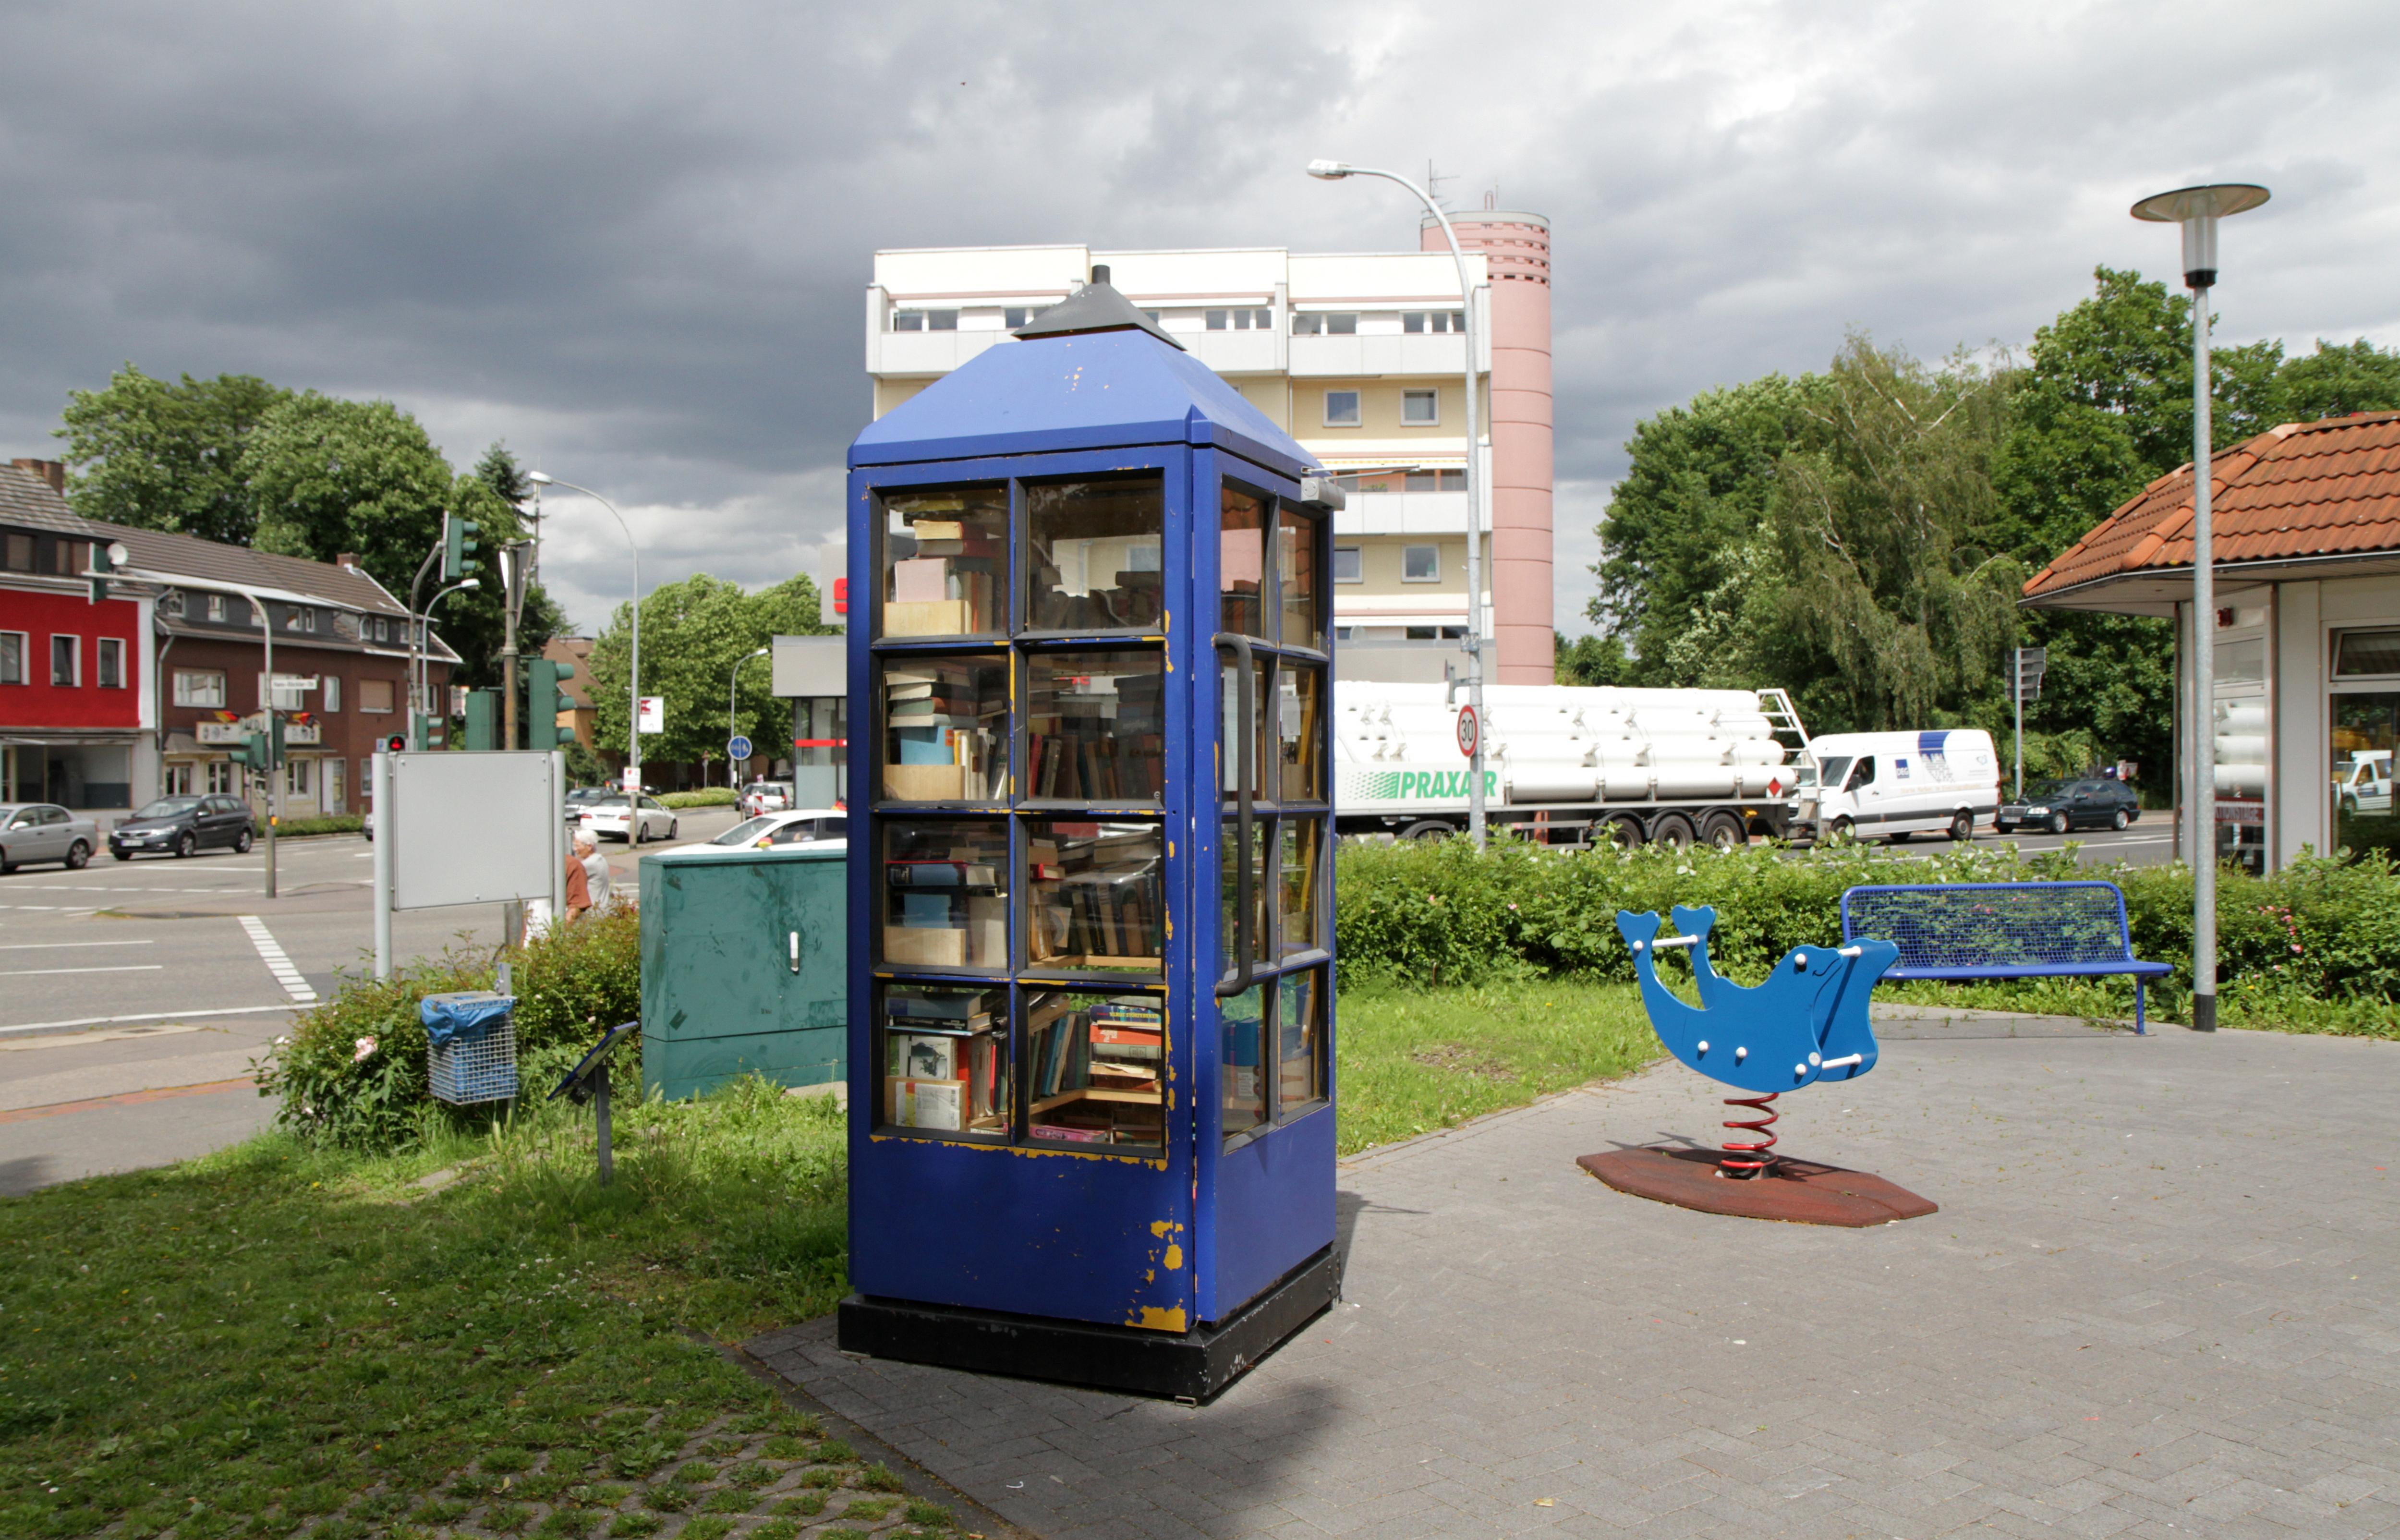 File:Offener Bücherschrank Hürth-Hermülheim a.jpg - Wikimedia Commons